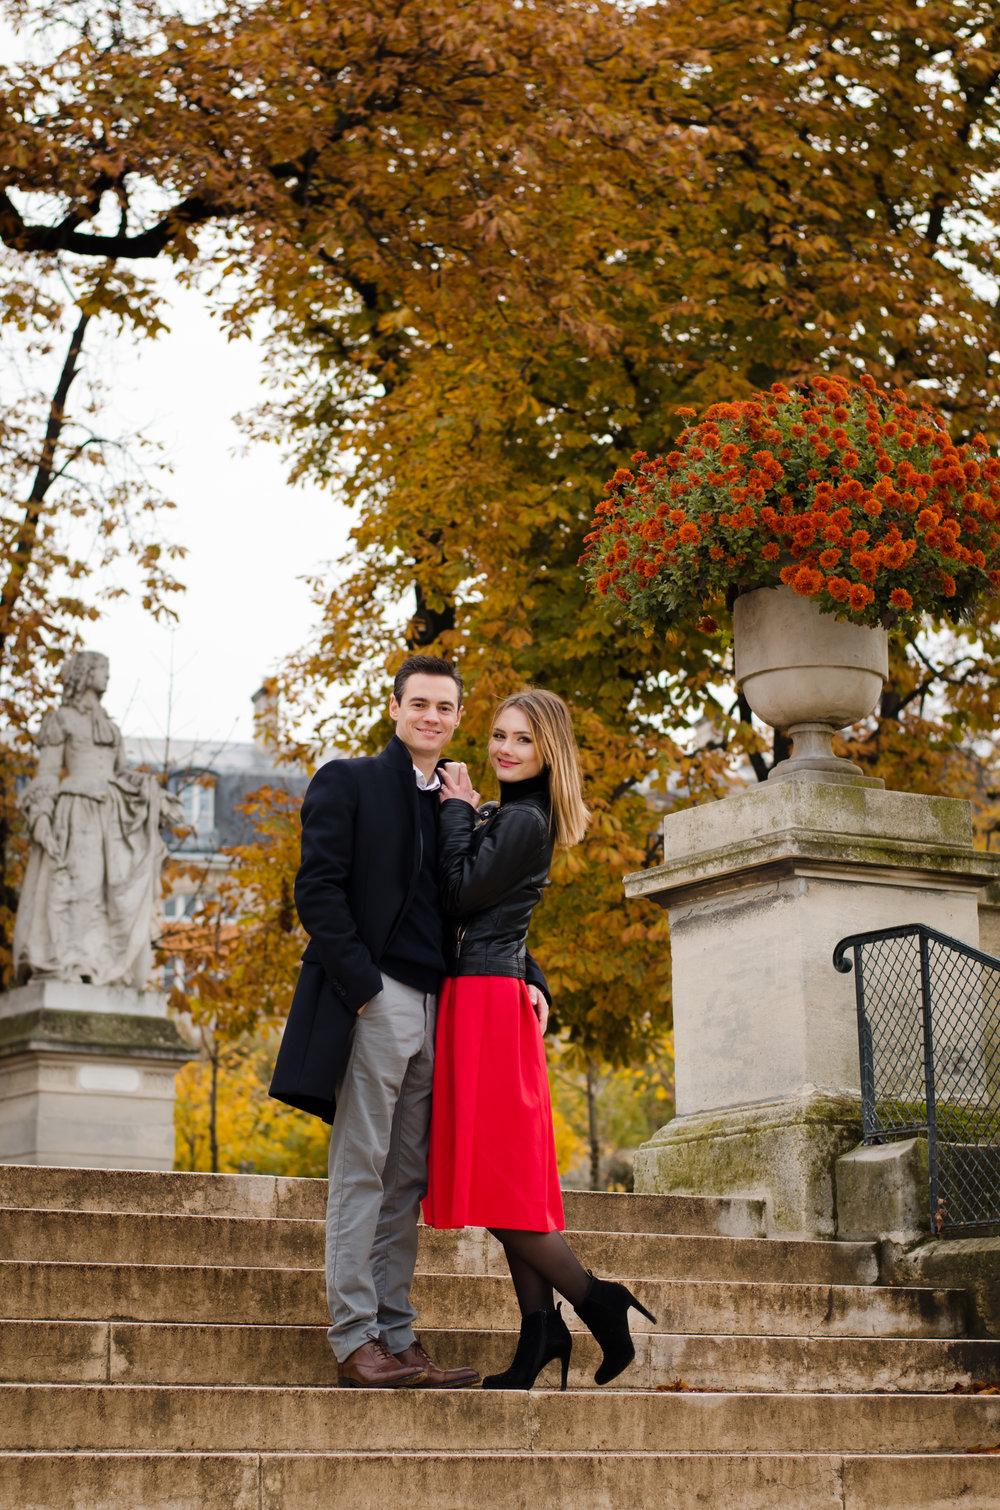 Paris engagement photoshoot in the fall Kat & Ed 5 Nov 2016-99.jpg